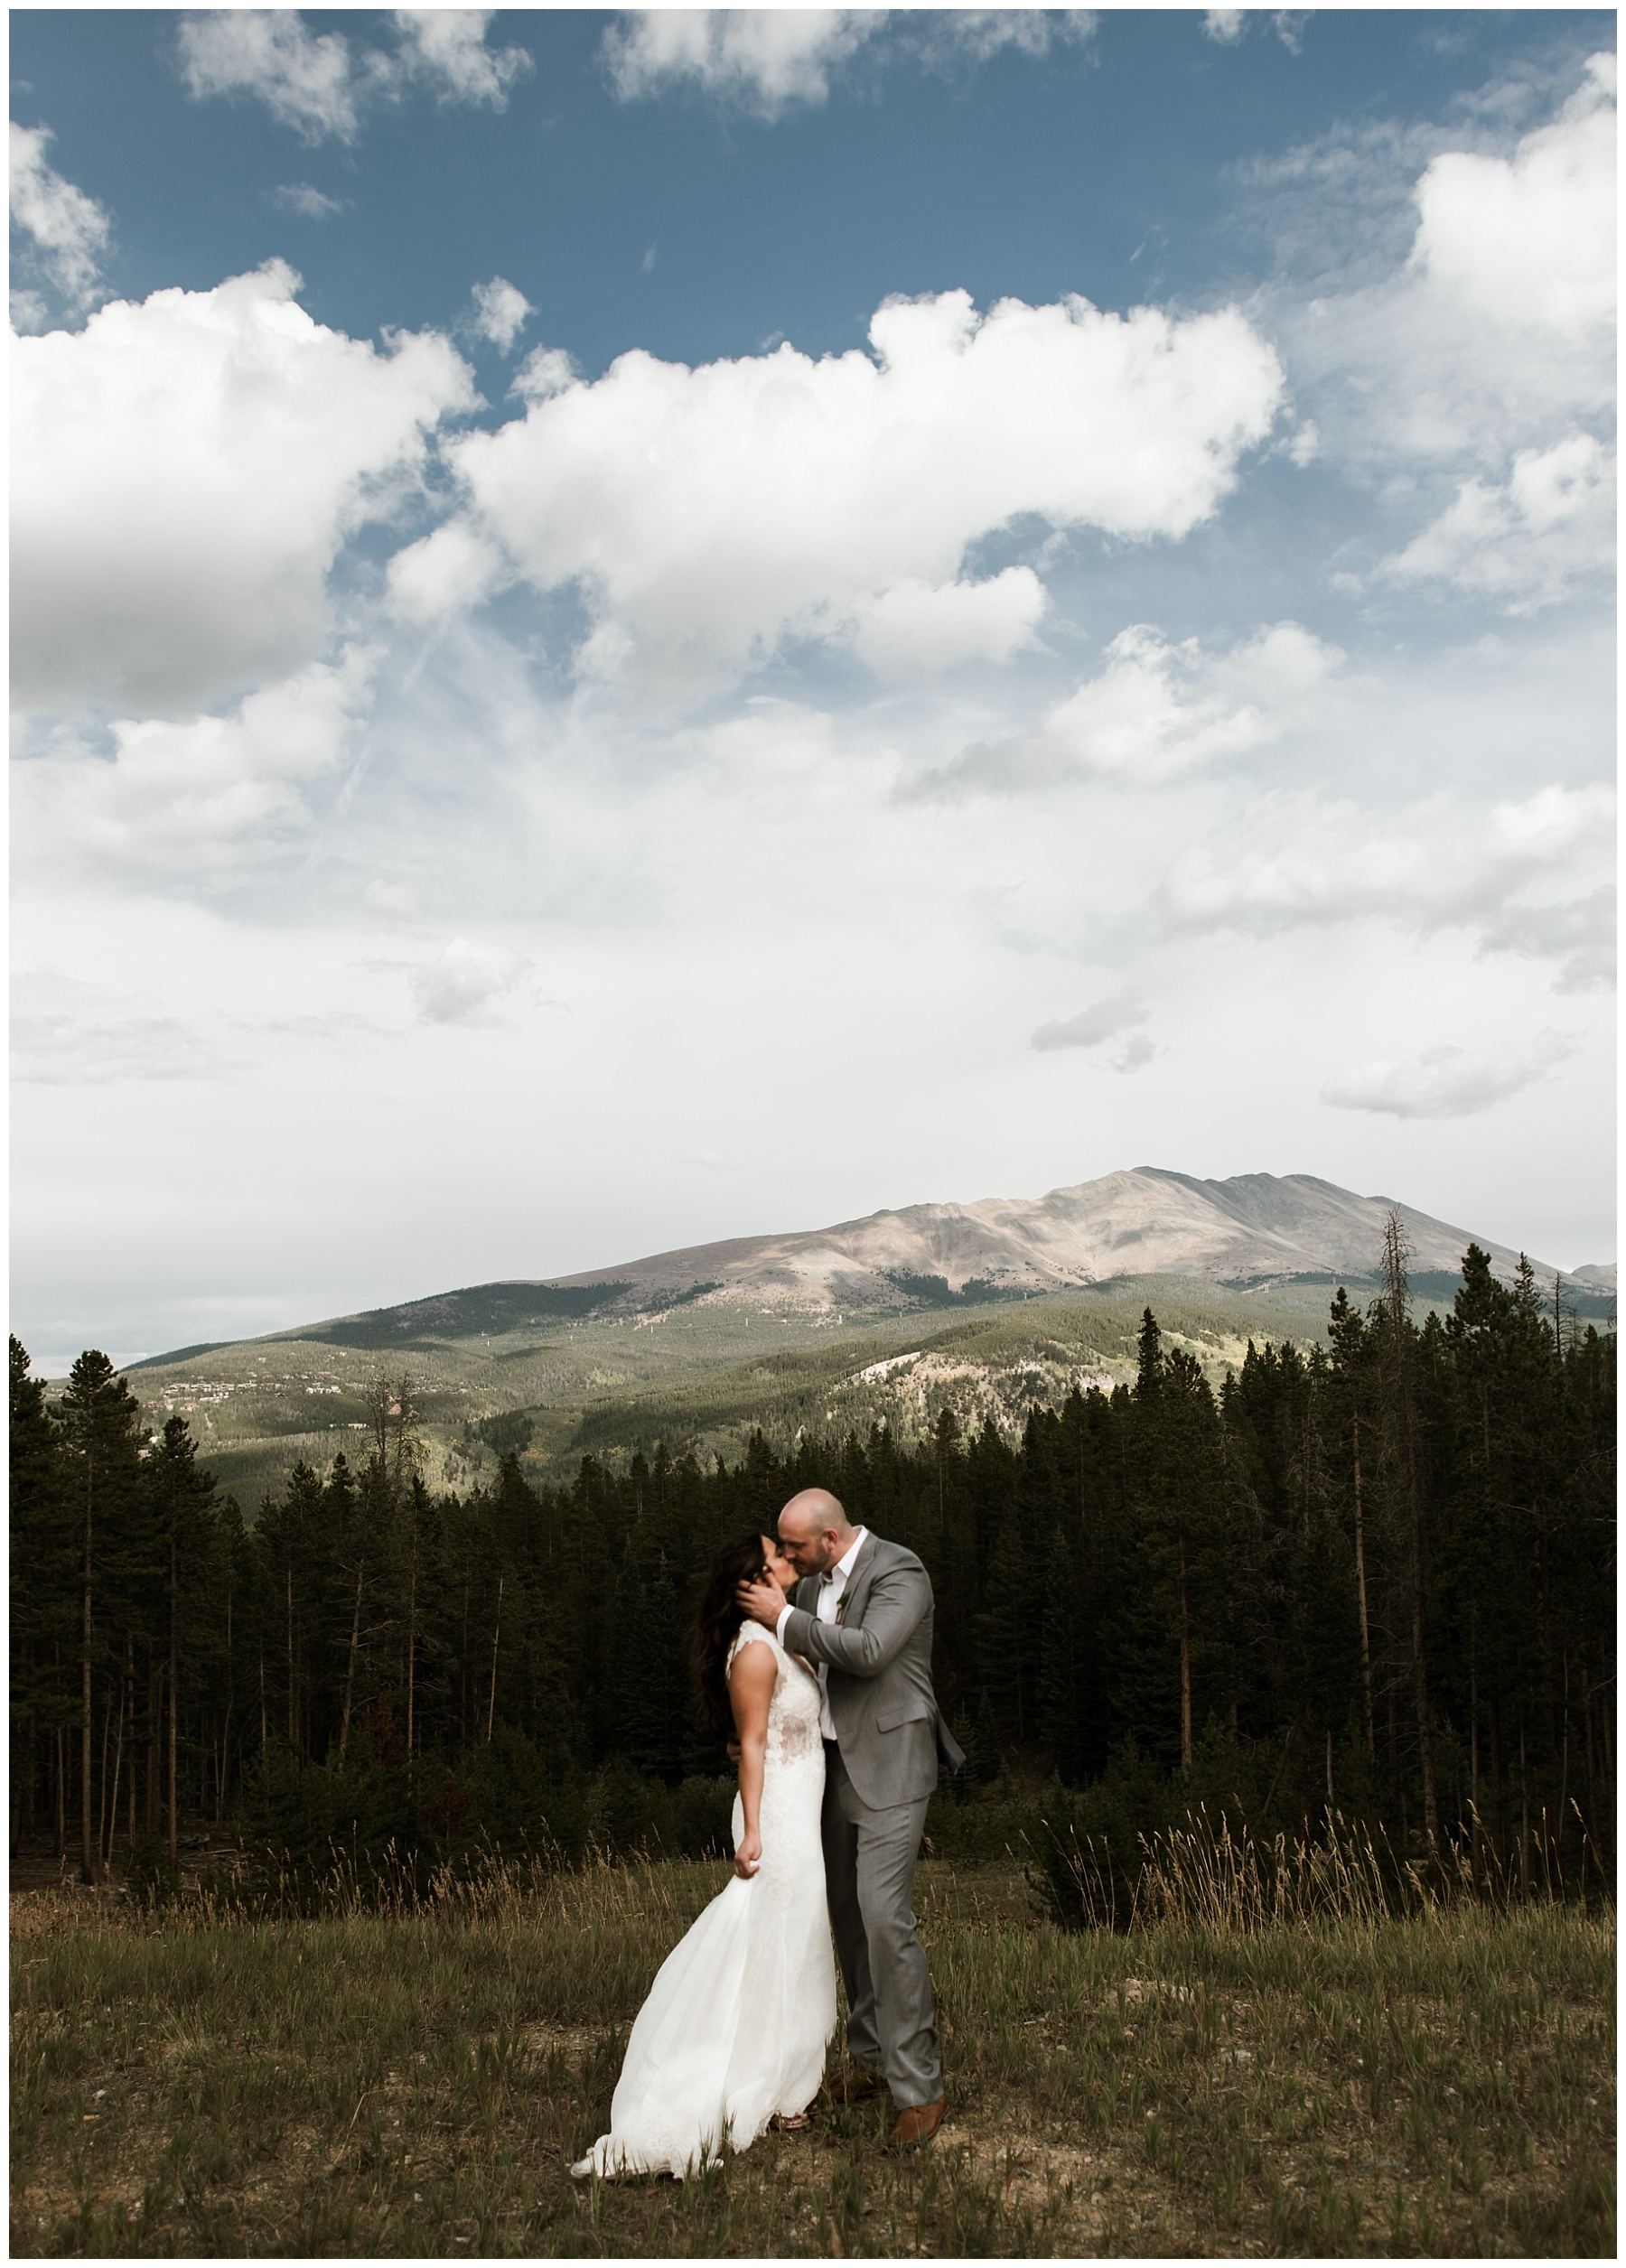 Katesalleyphotography-224_married in Breckenridge.jpg